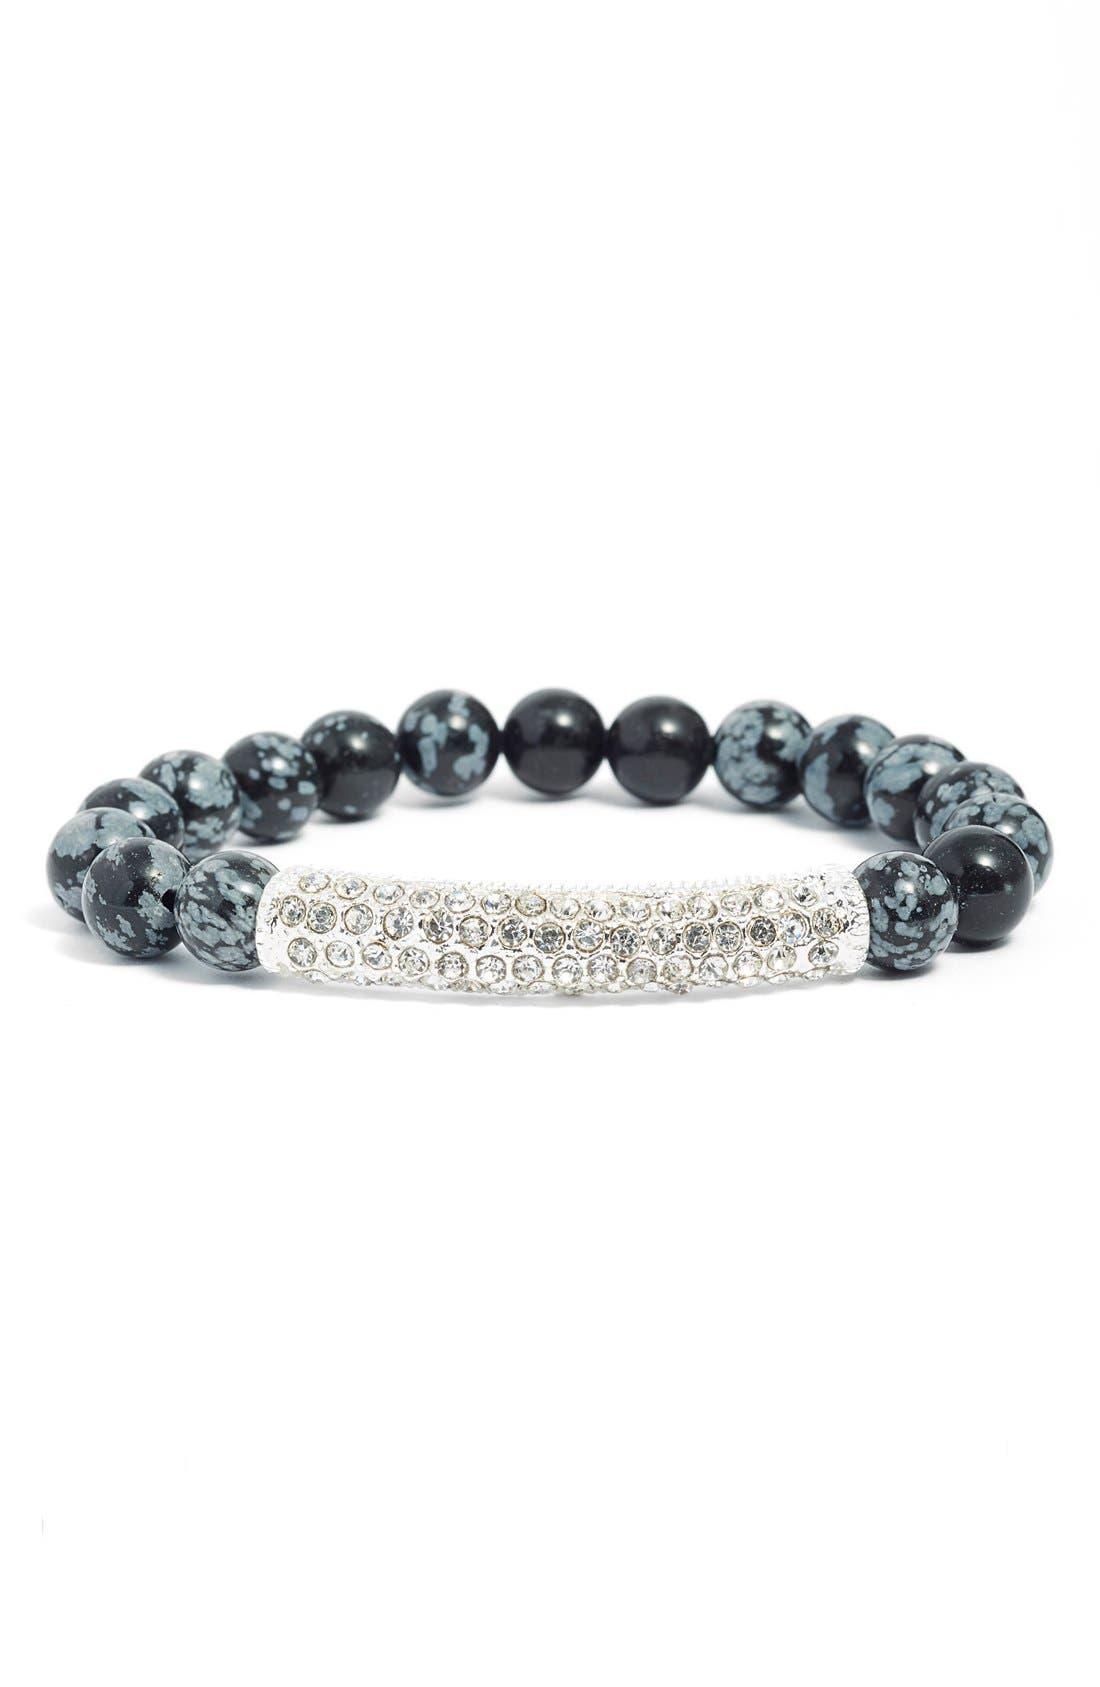 Main Image - Elise M. 'Calypso' Pavé Crystal Beaded Bracelet